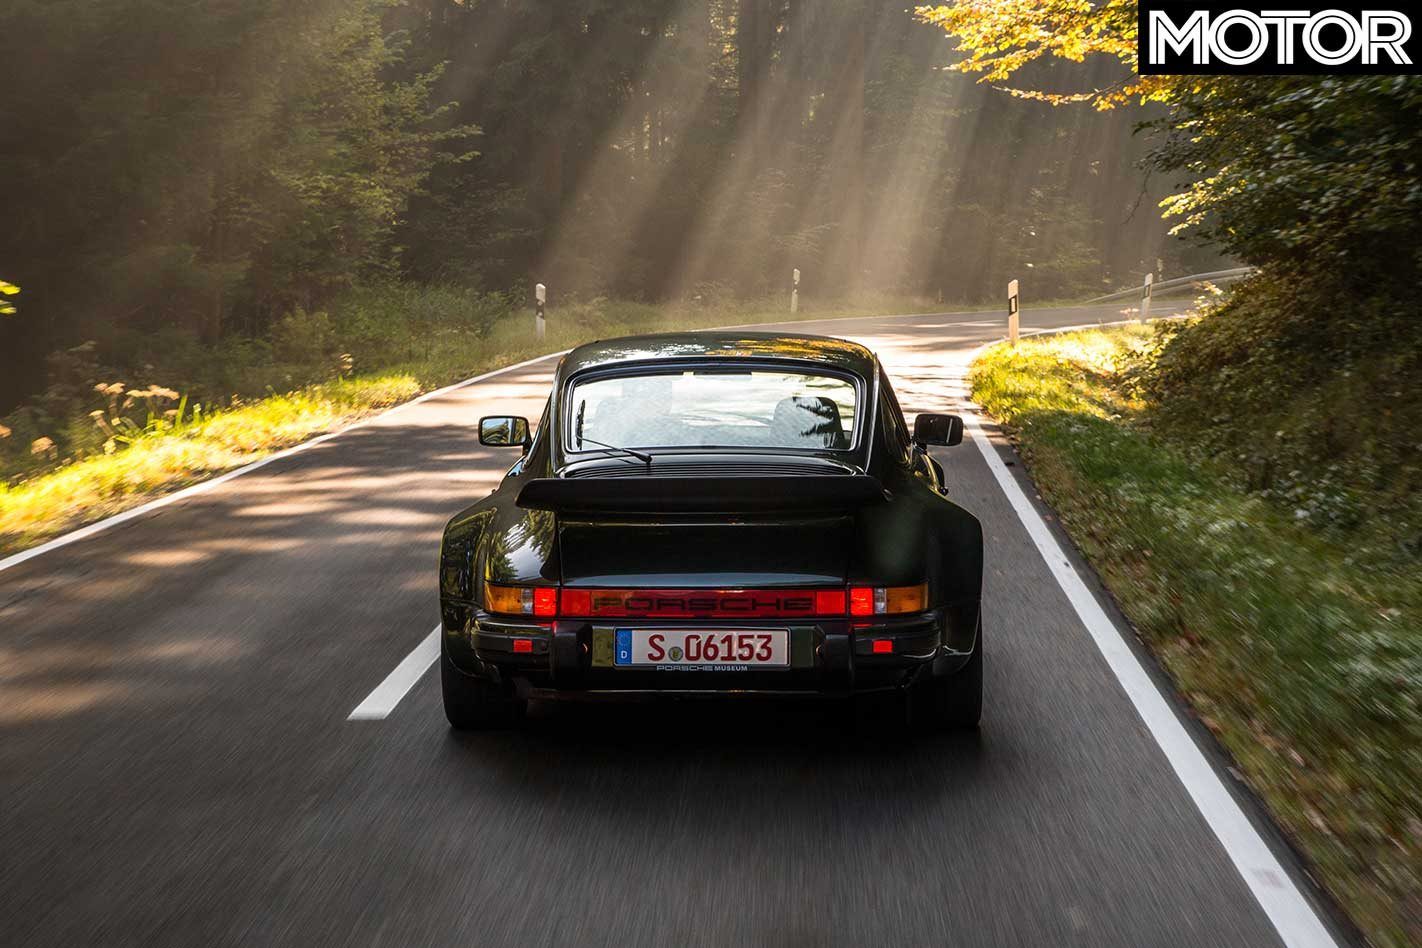 1975 Porsche 911 930 Turbo The Five Greatest 911s